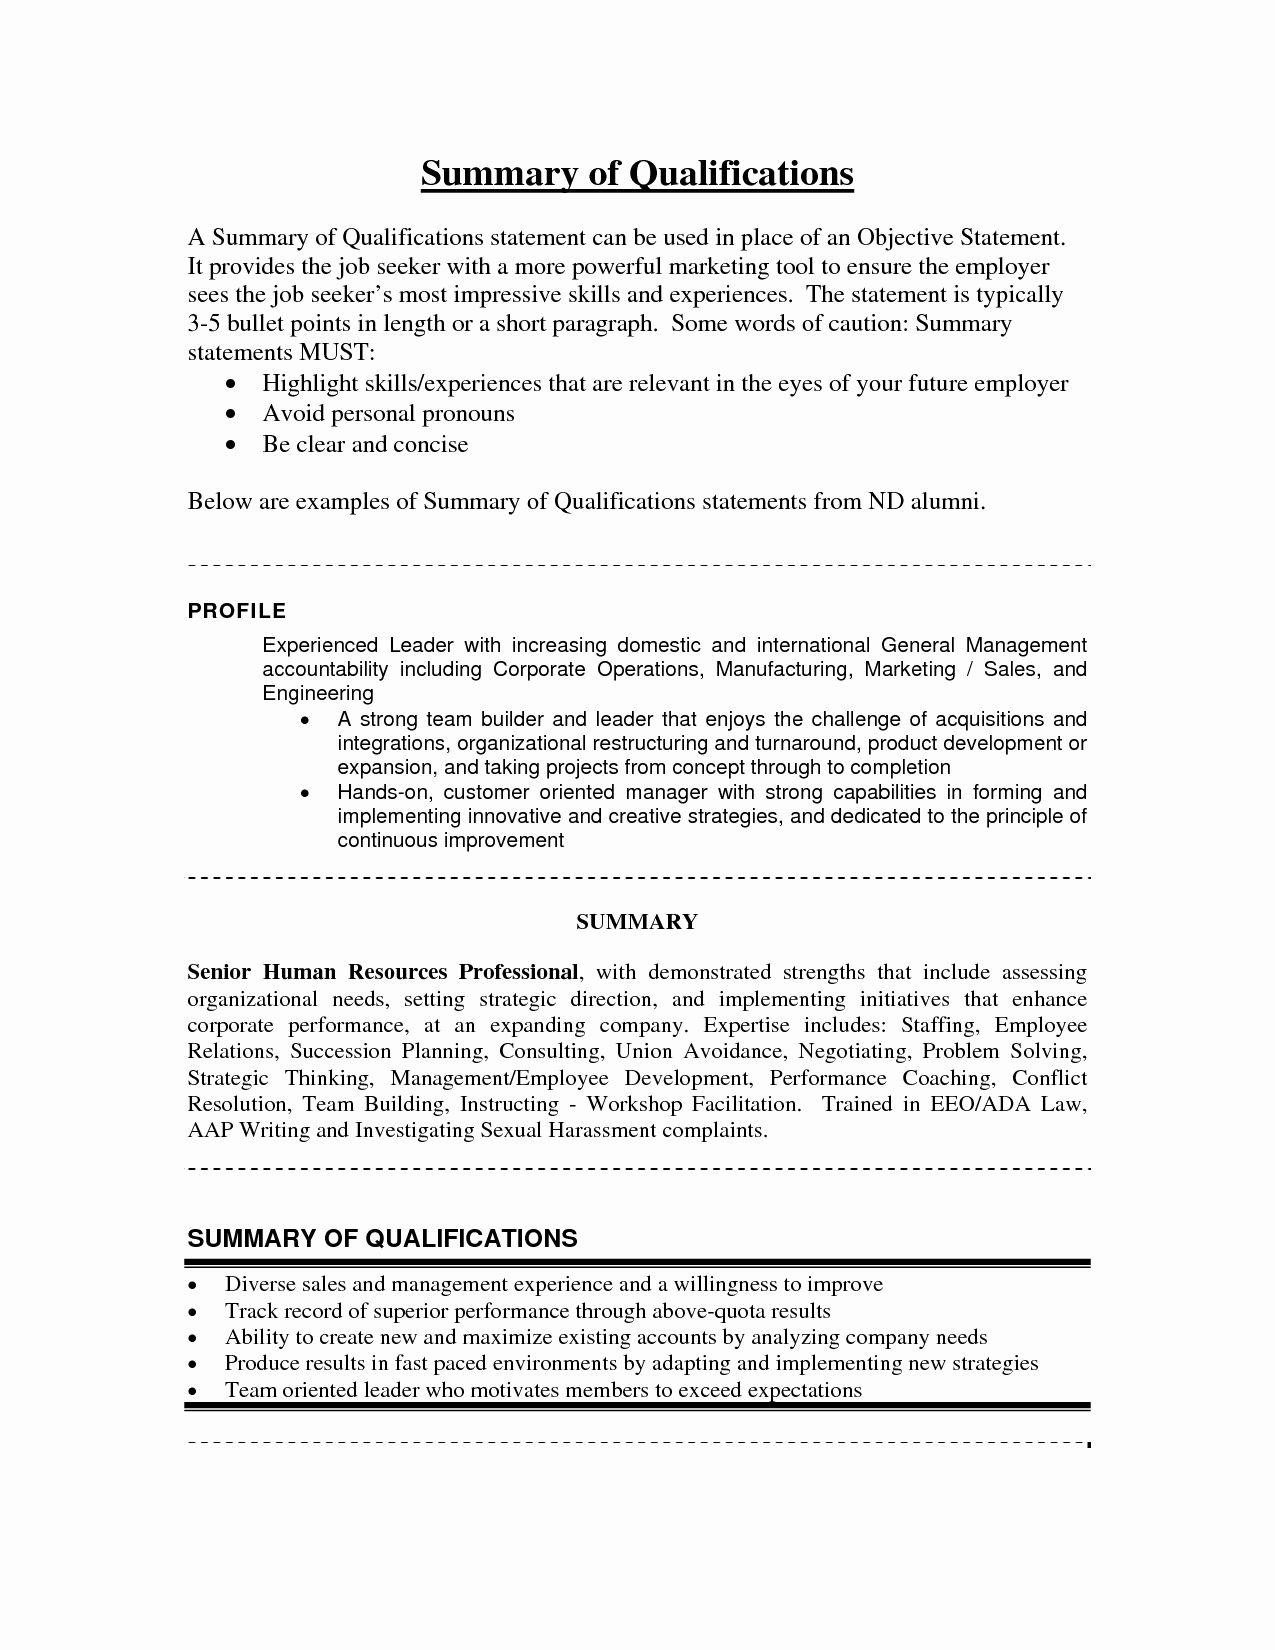 Resume Summary Statement Example Luxury Summary Qualifications